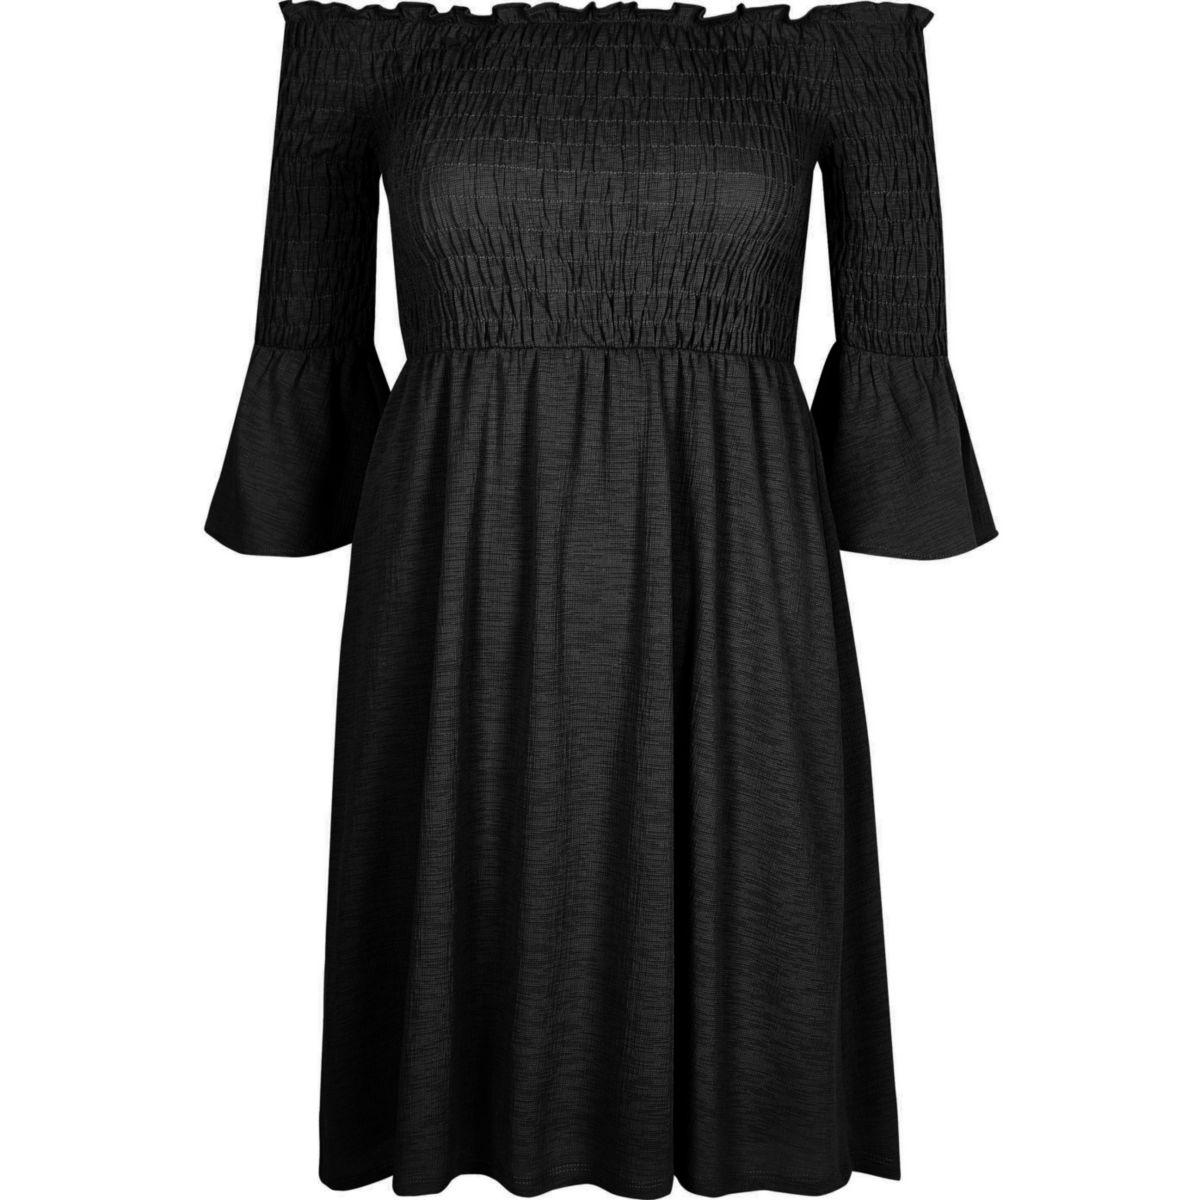 Schwarzes, gesmoktes Bardot-Kleid